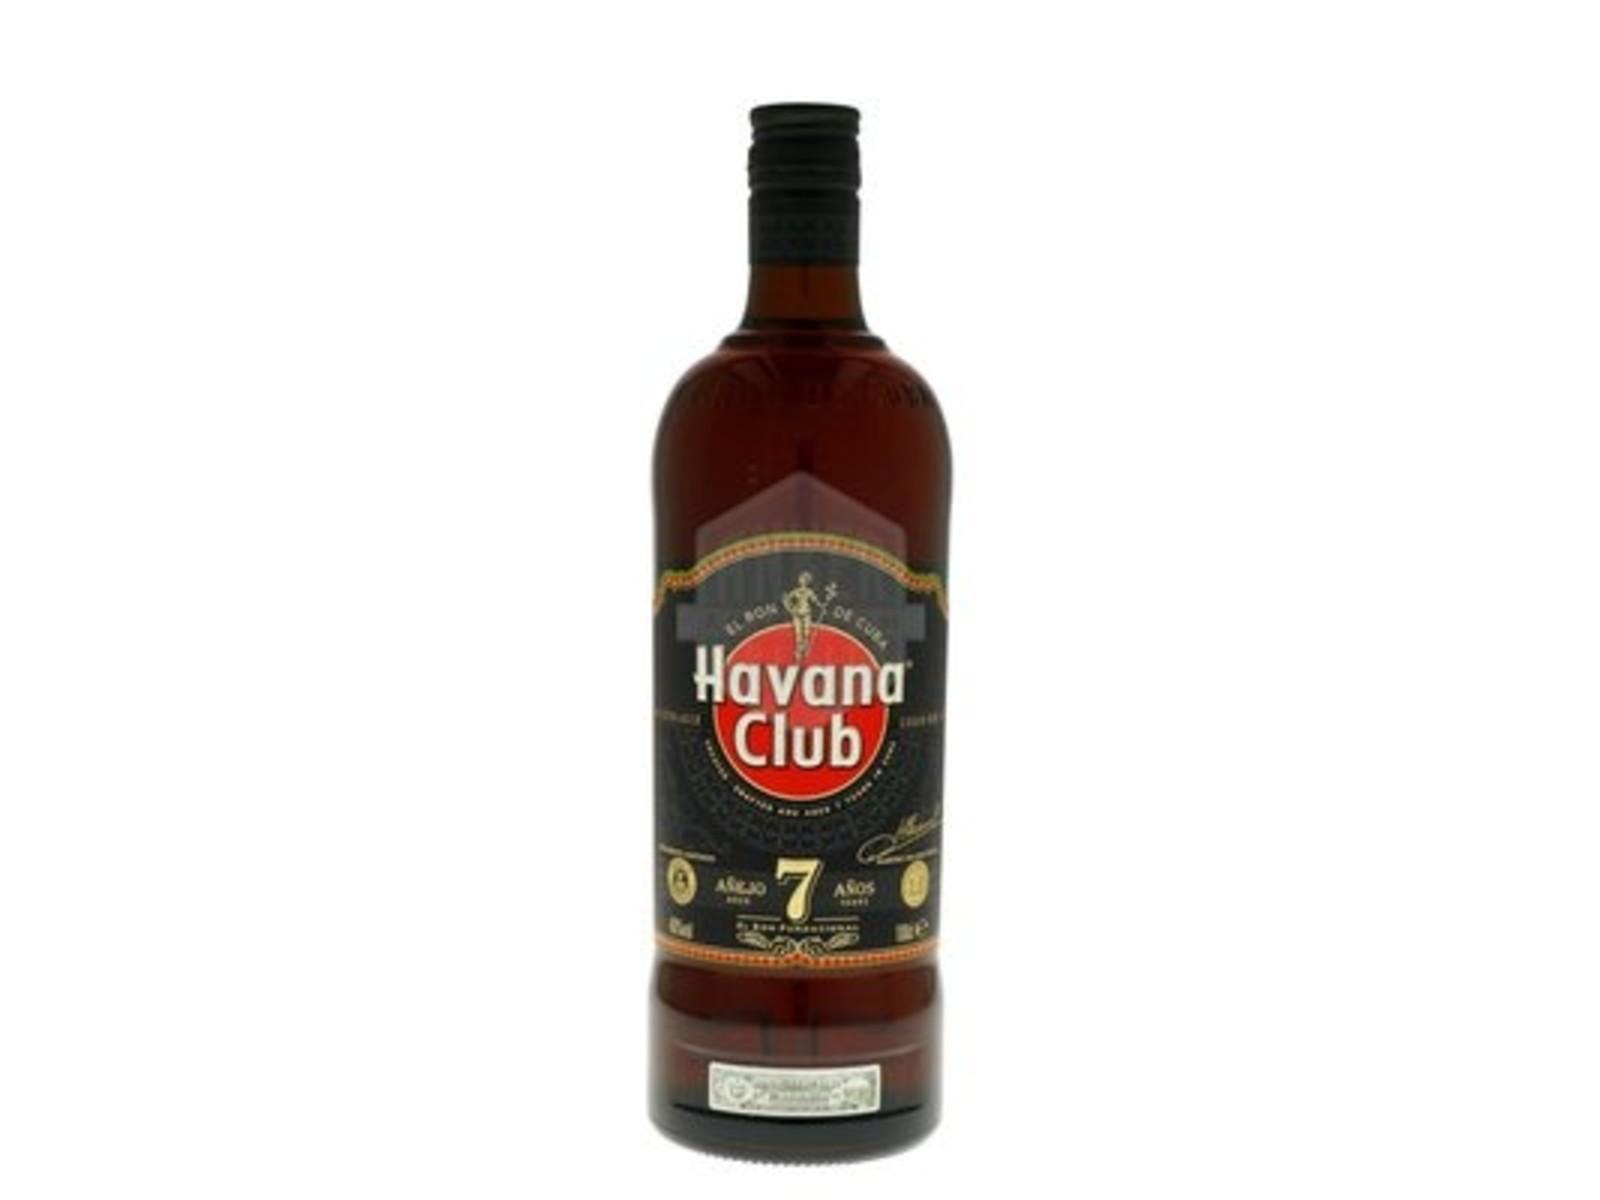 Havana Club Havana Club / 7 years / 1L